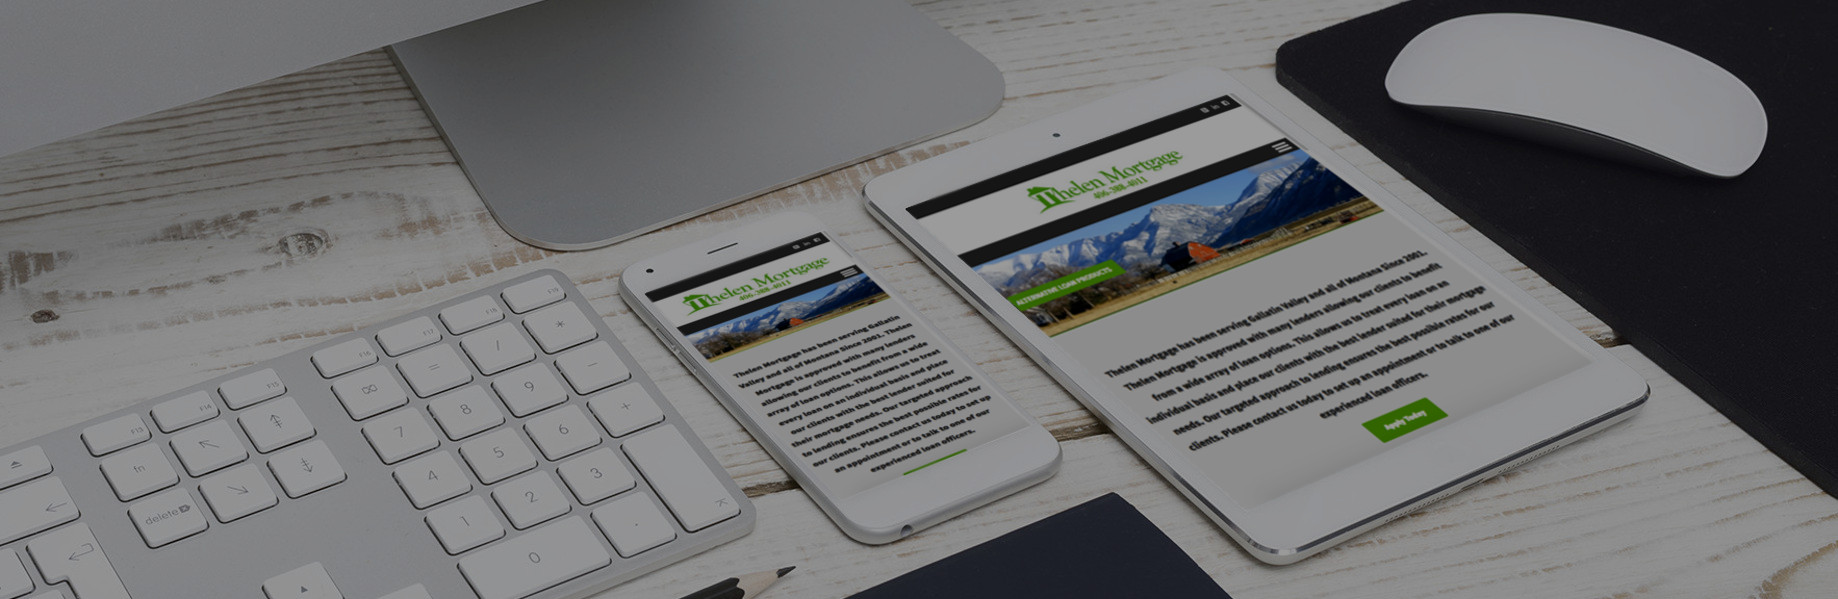 Internet Marketing Services   Website Design   SEO   Branding Iron Marketing, LLC   Bozeman, MT